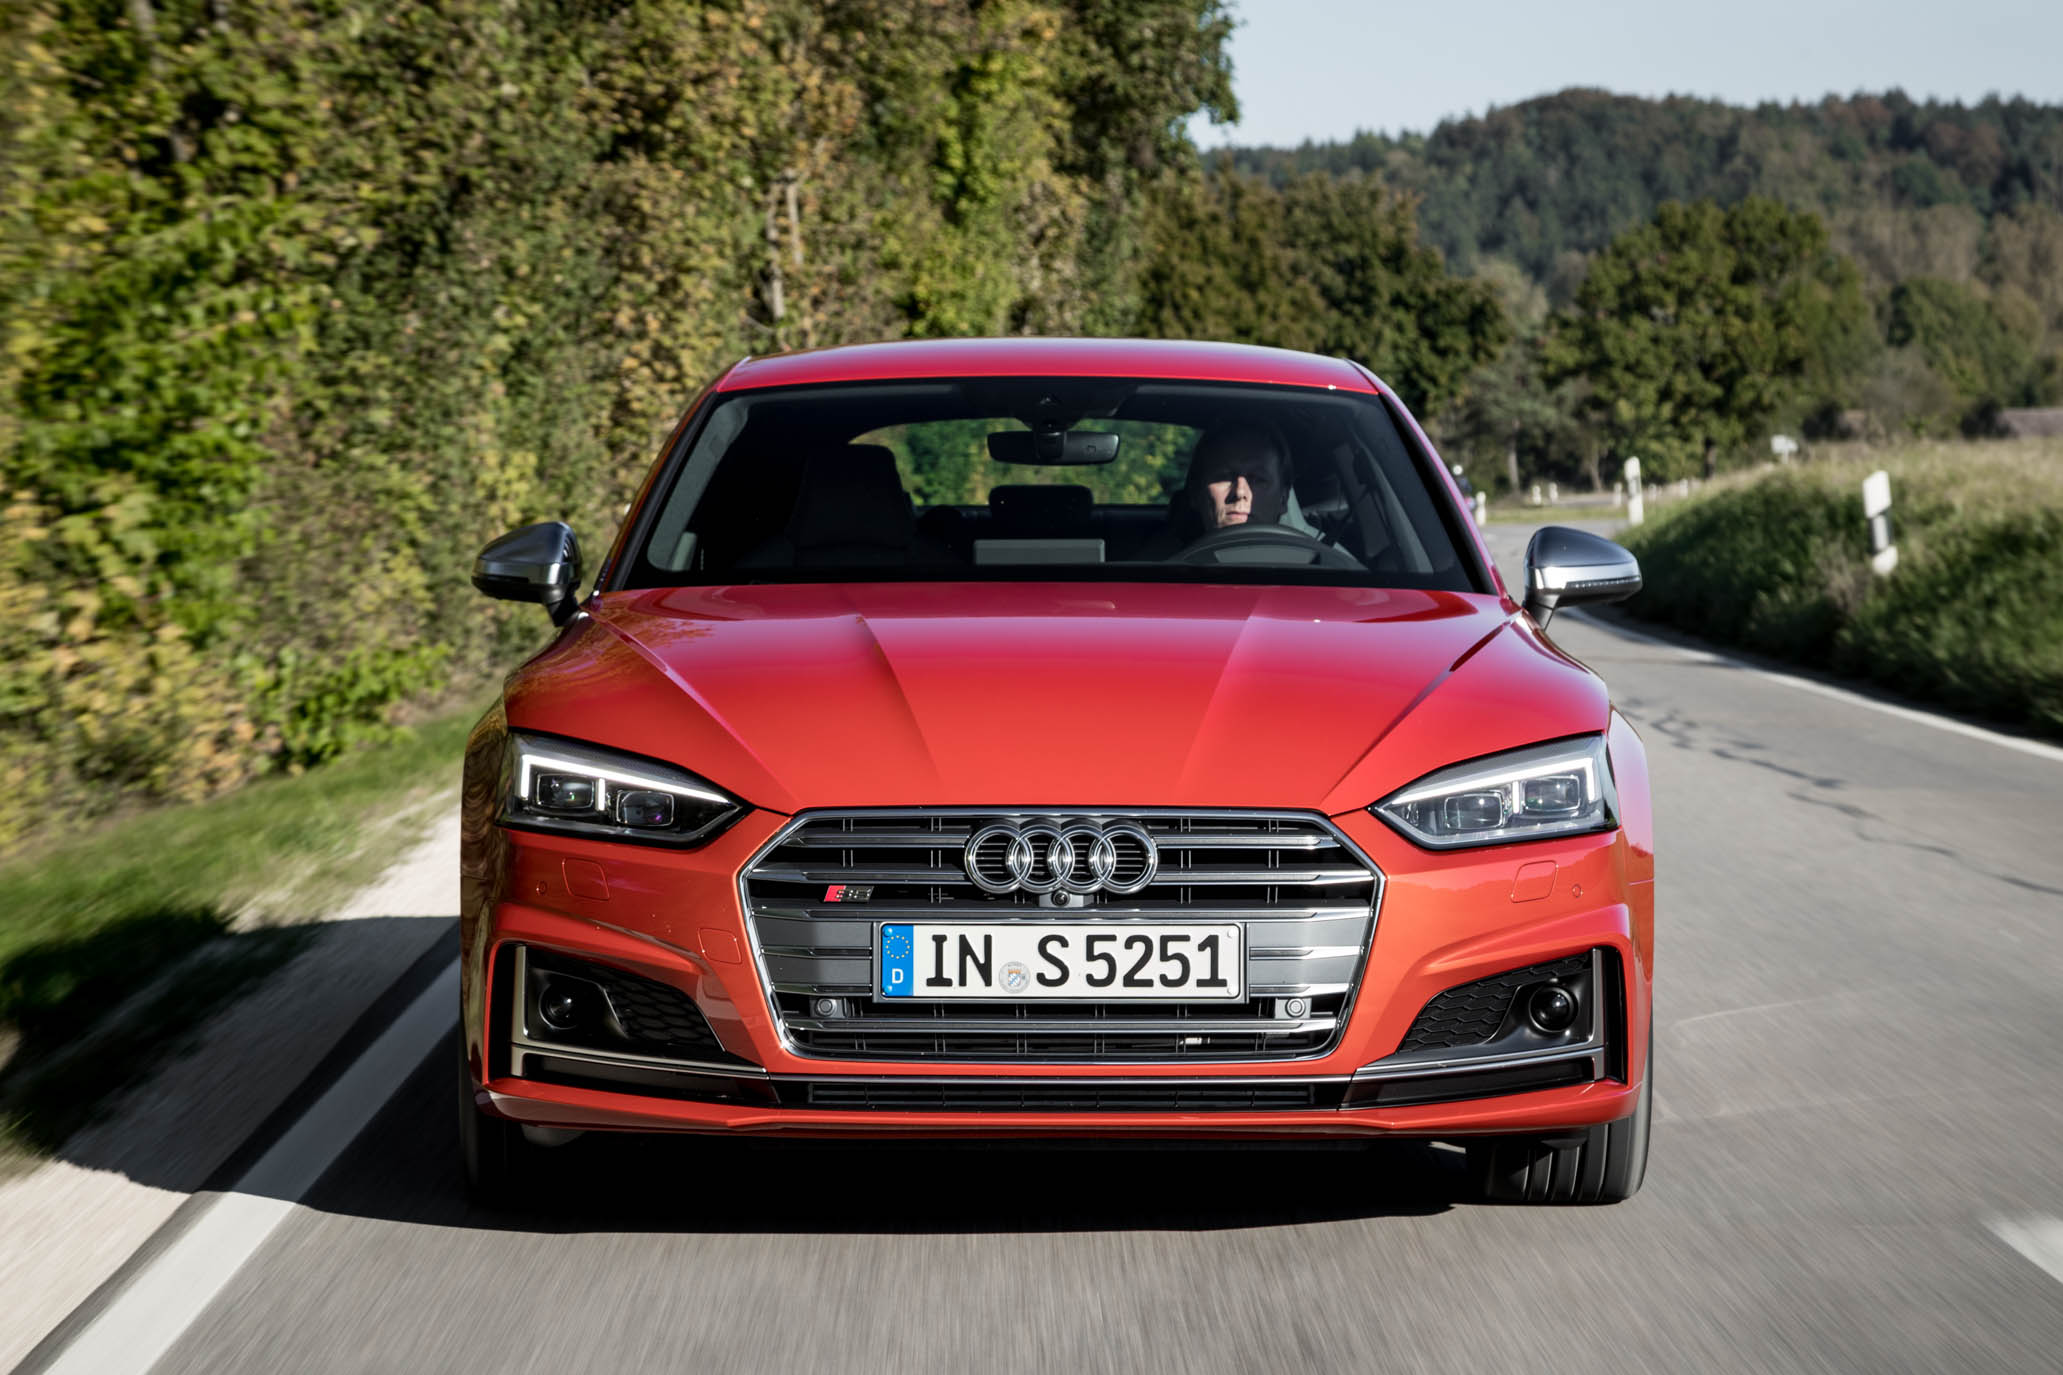 2017 Audi S5 Sportback (View 6 of 10)